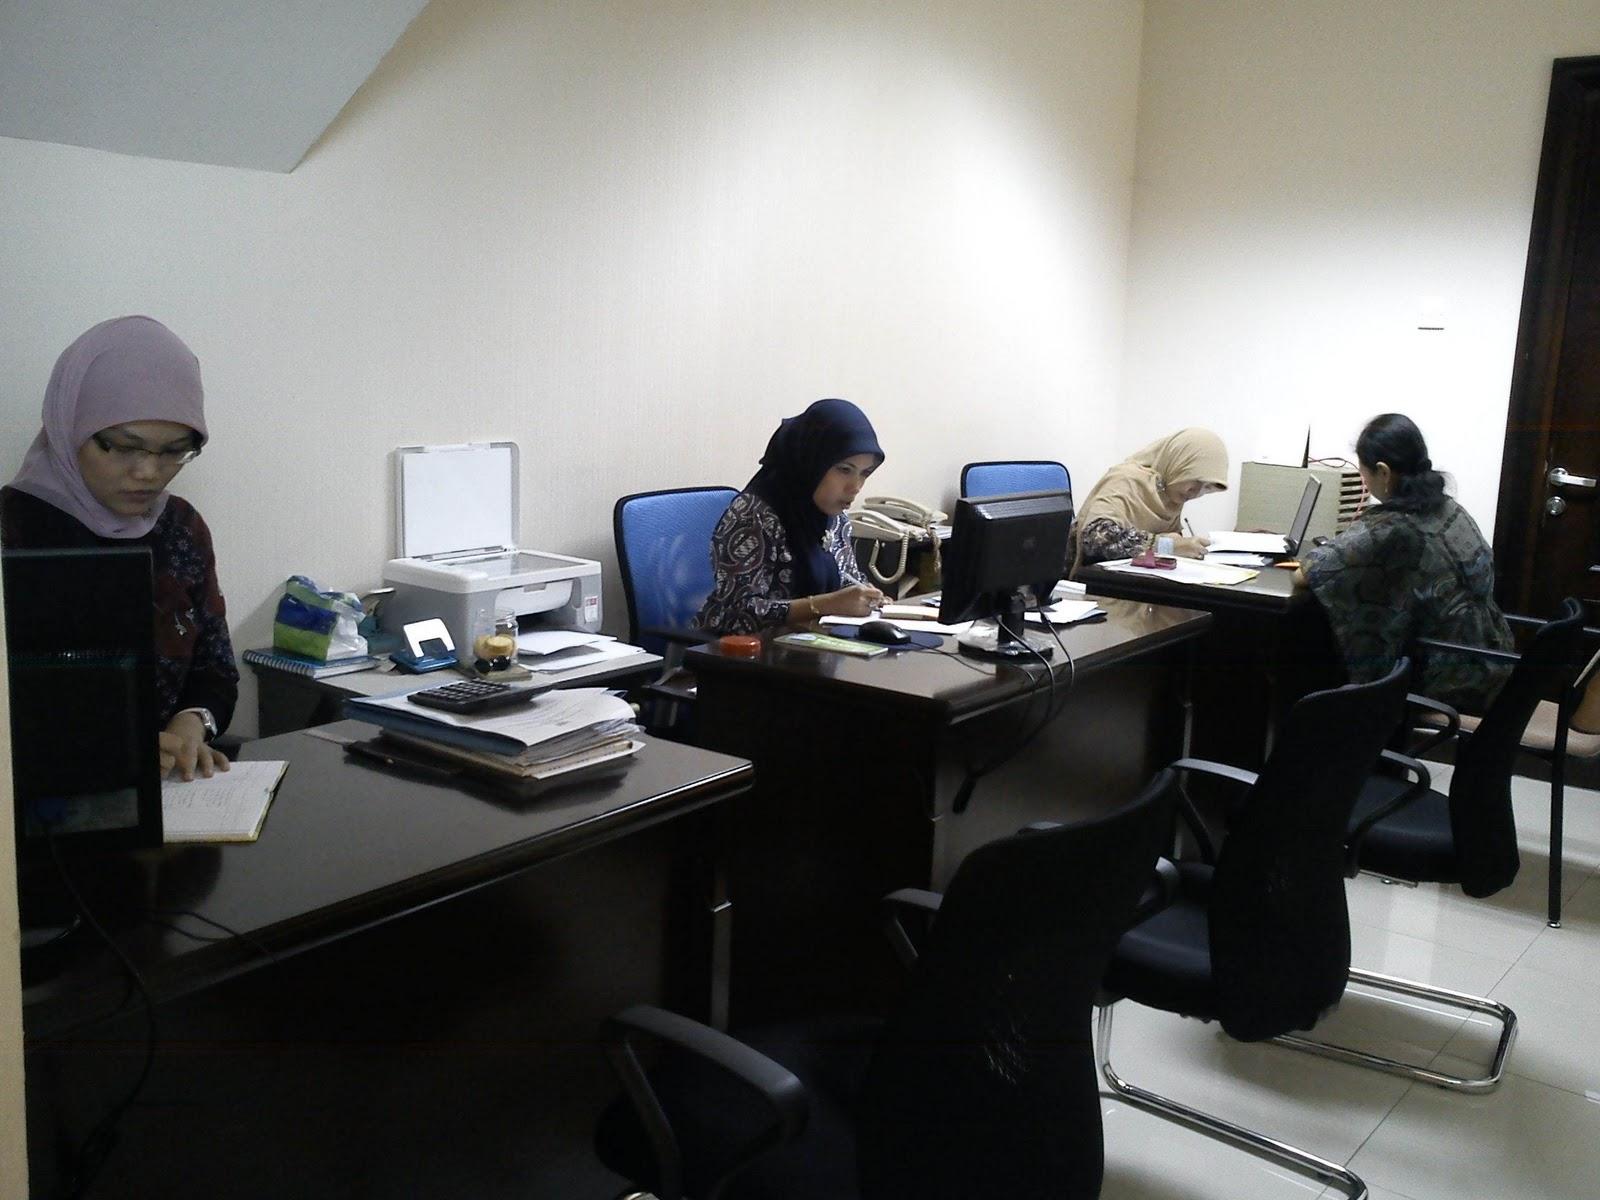 Gambar 3. Karyawan Manajemen Koperasi Arta Sarana Jahtera